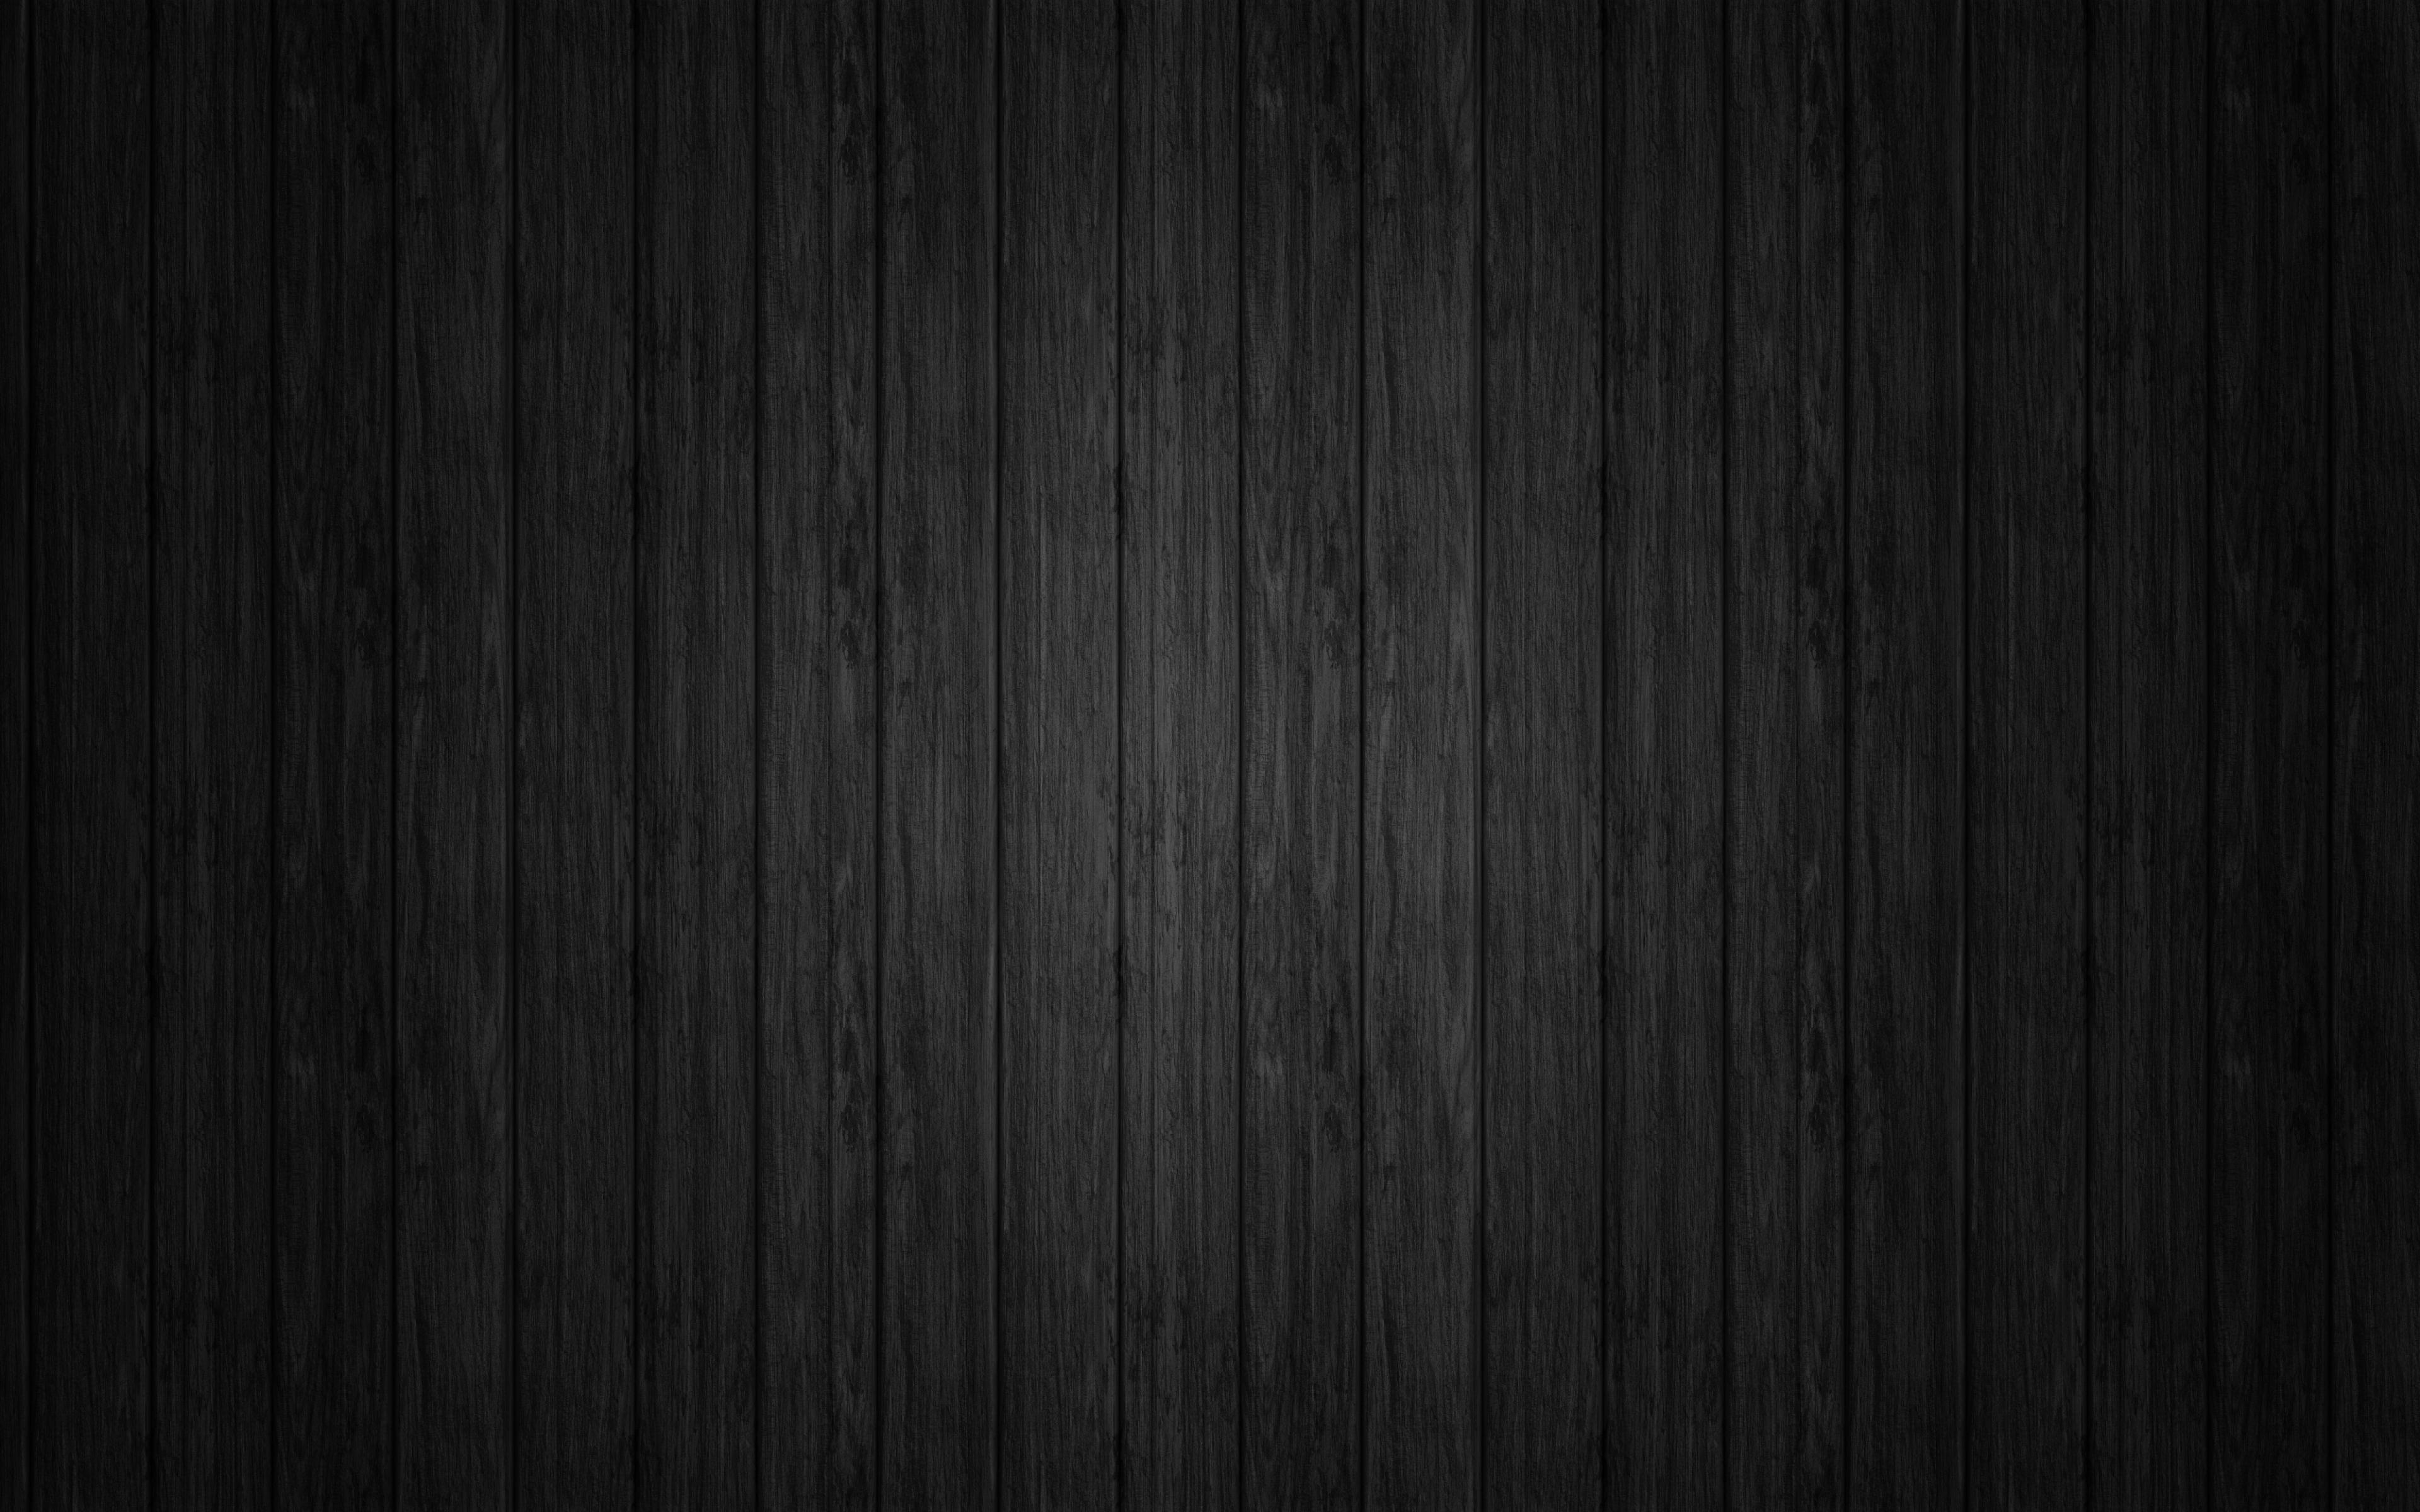 Download HD Black Stripes Wood Texture Wallpaper WallpapersByte 3840x2400